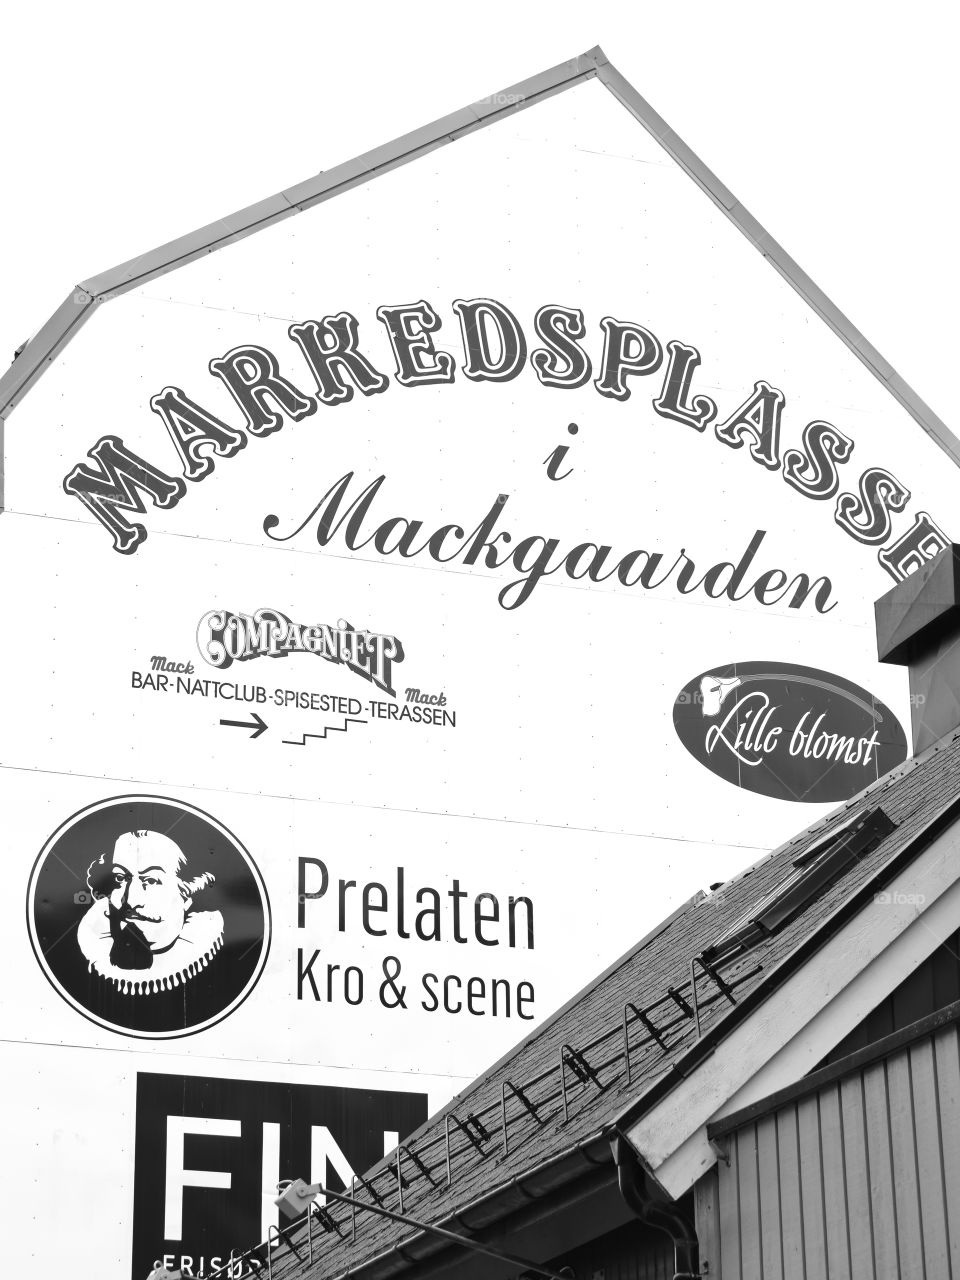 Advertising in Tromsø